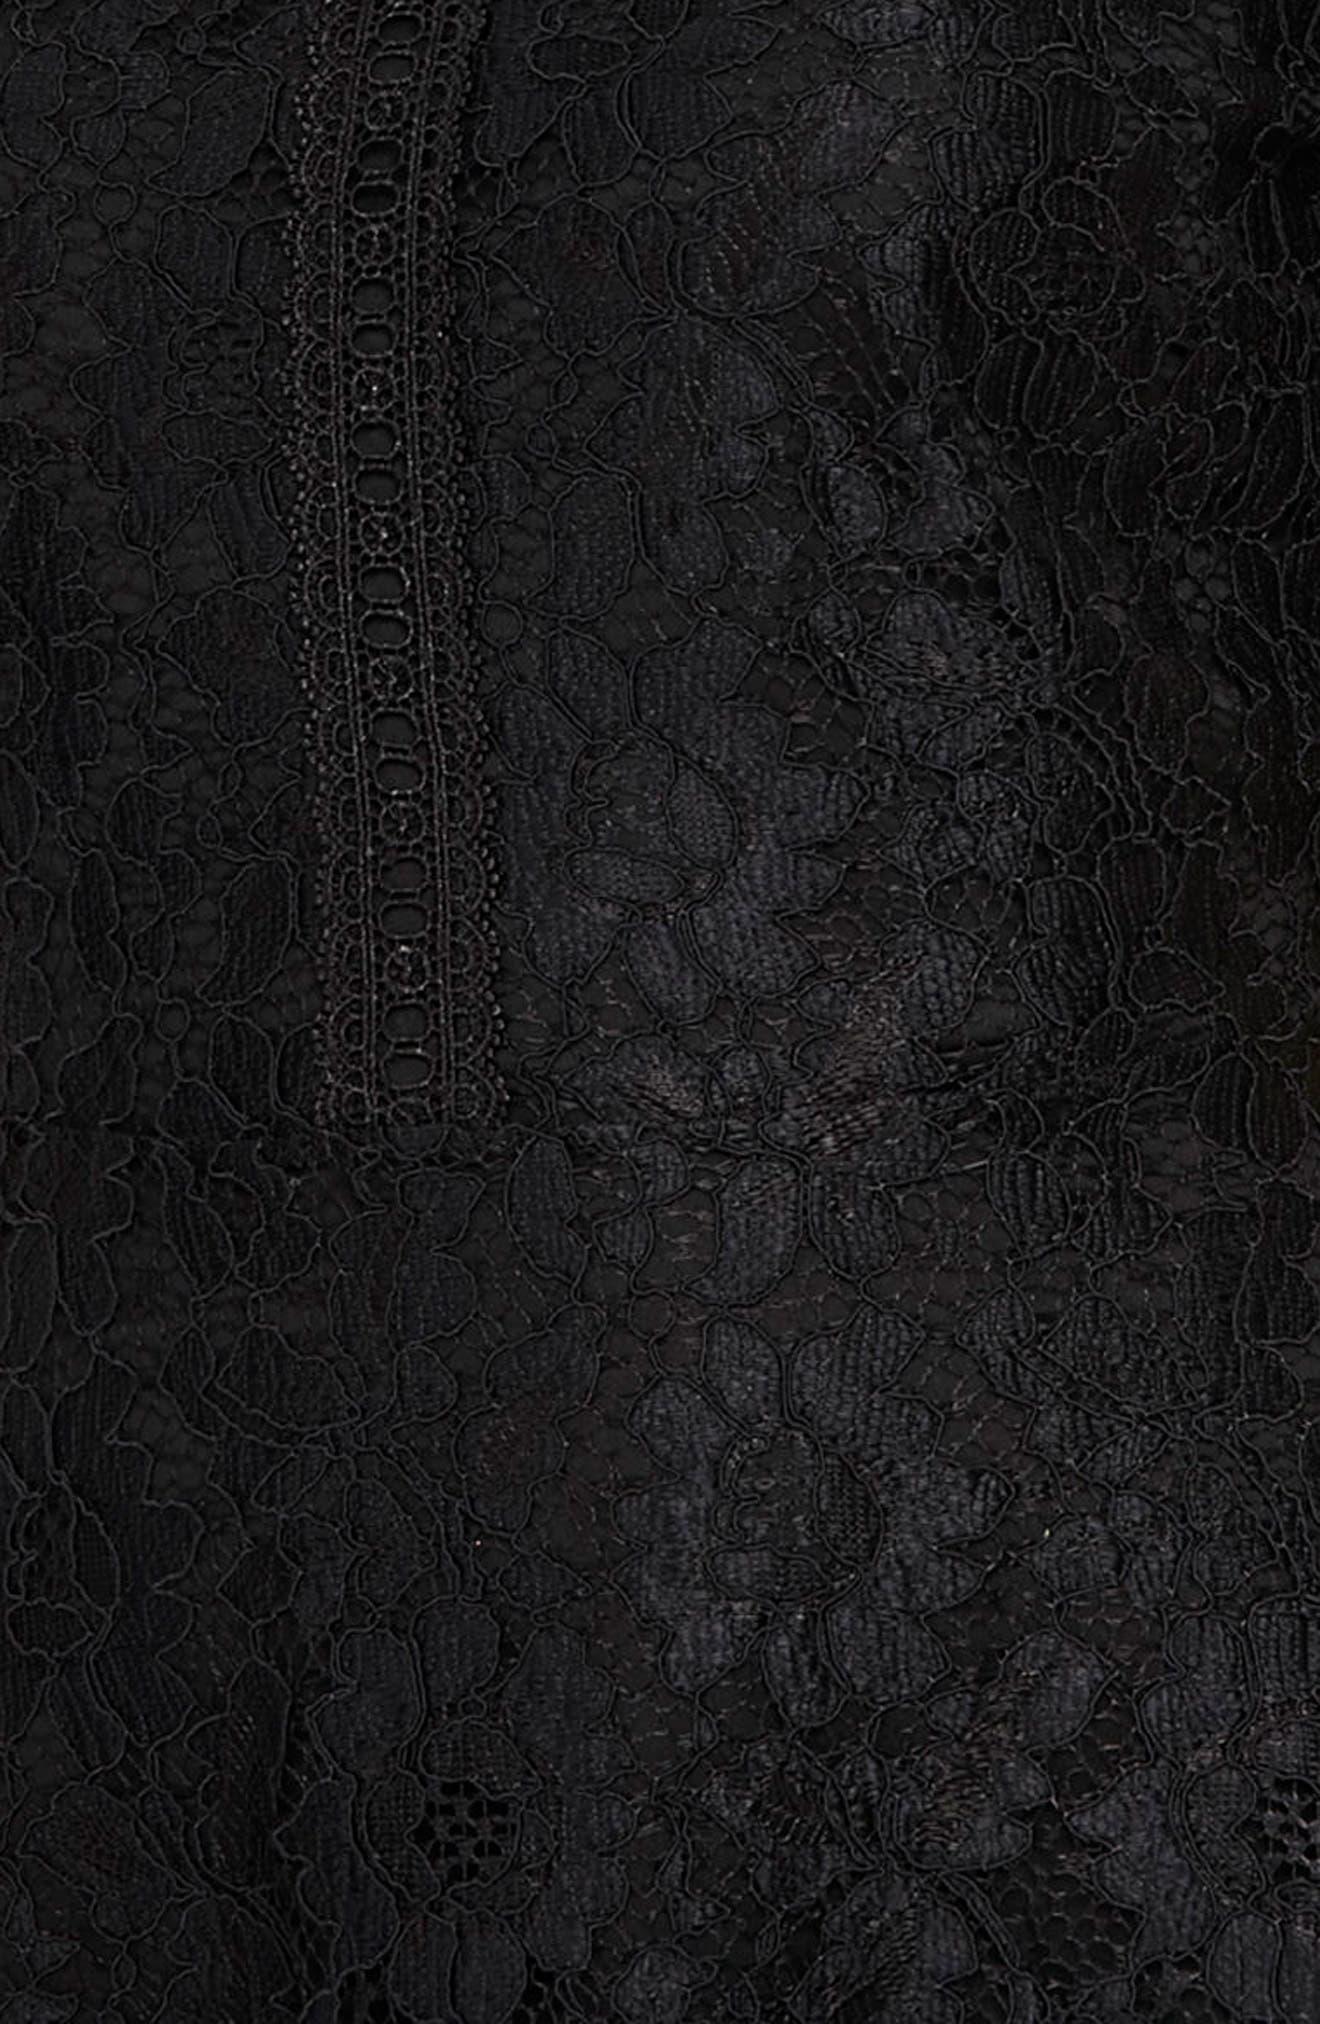 Lace & Lattice Fit & Flare Dress,                             Alternate thumbnail 3, color,                             001